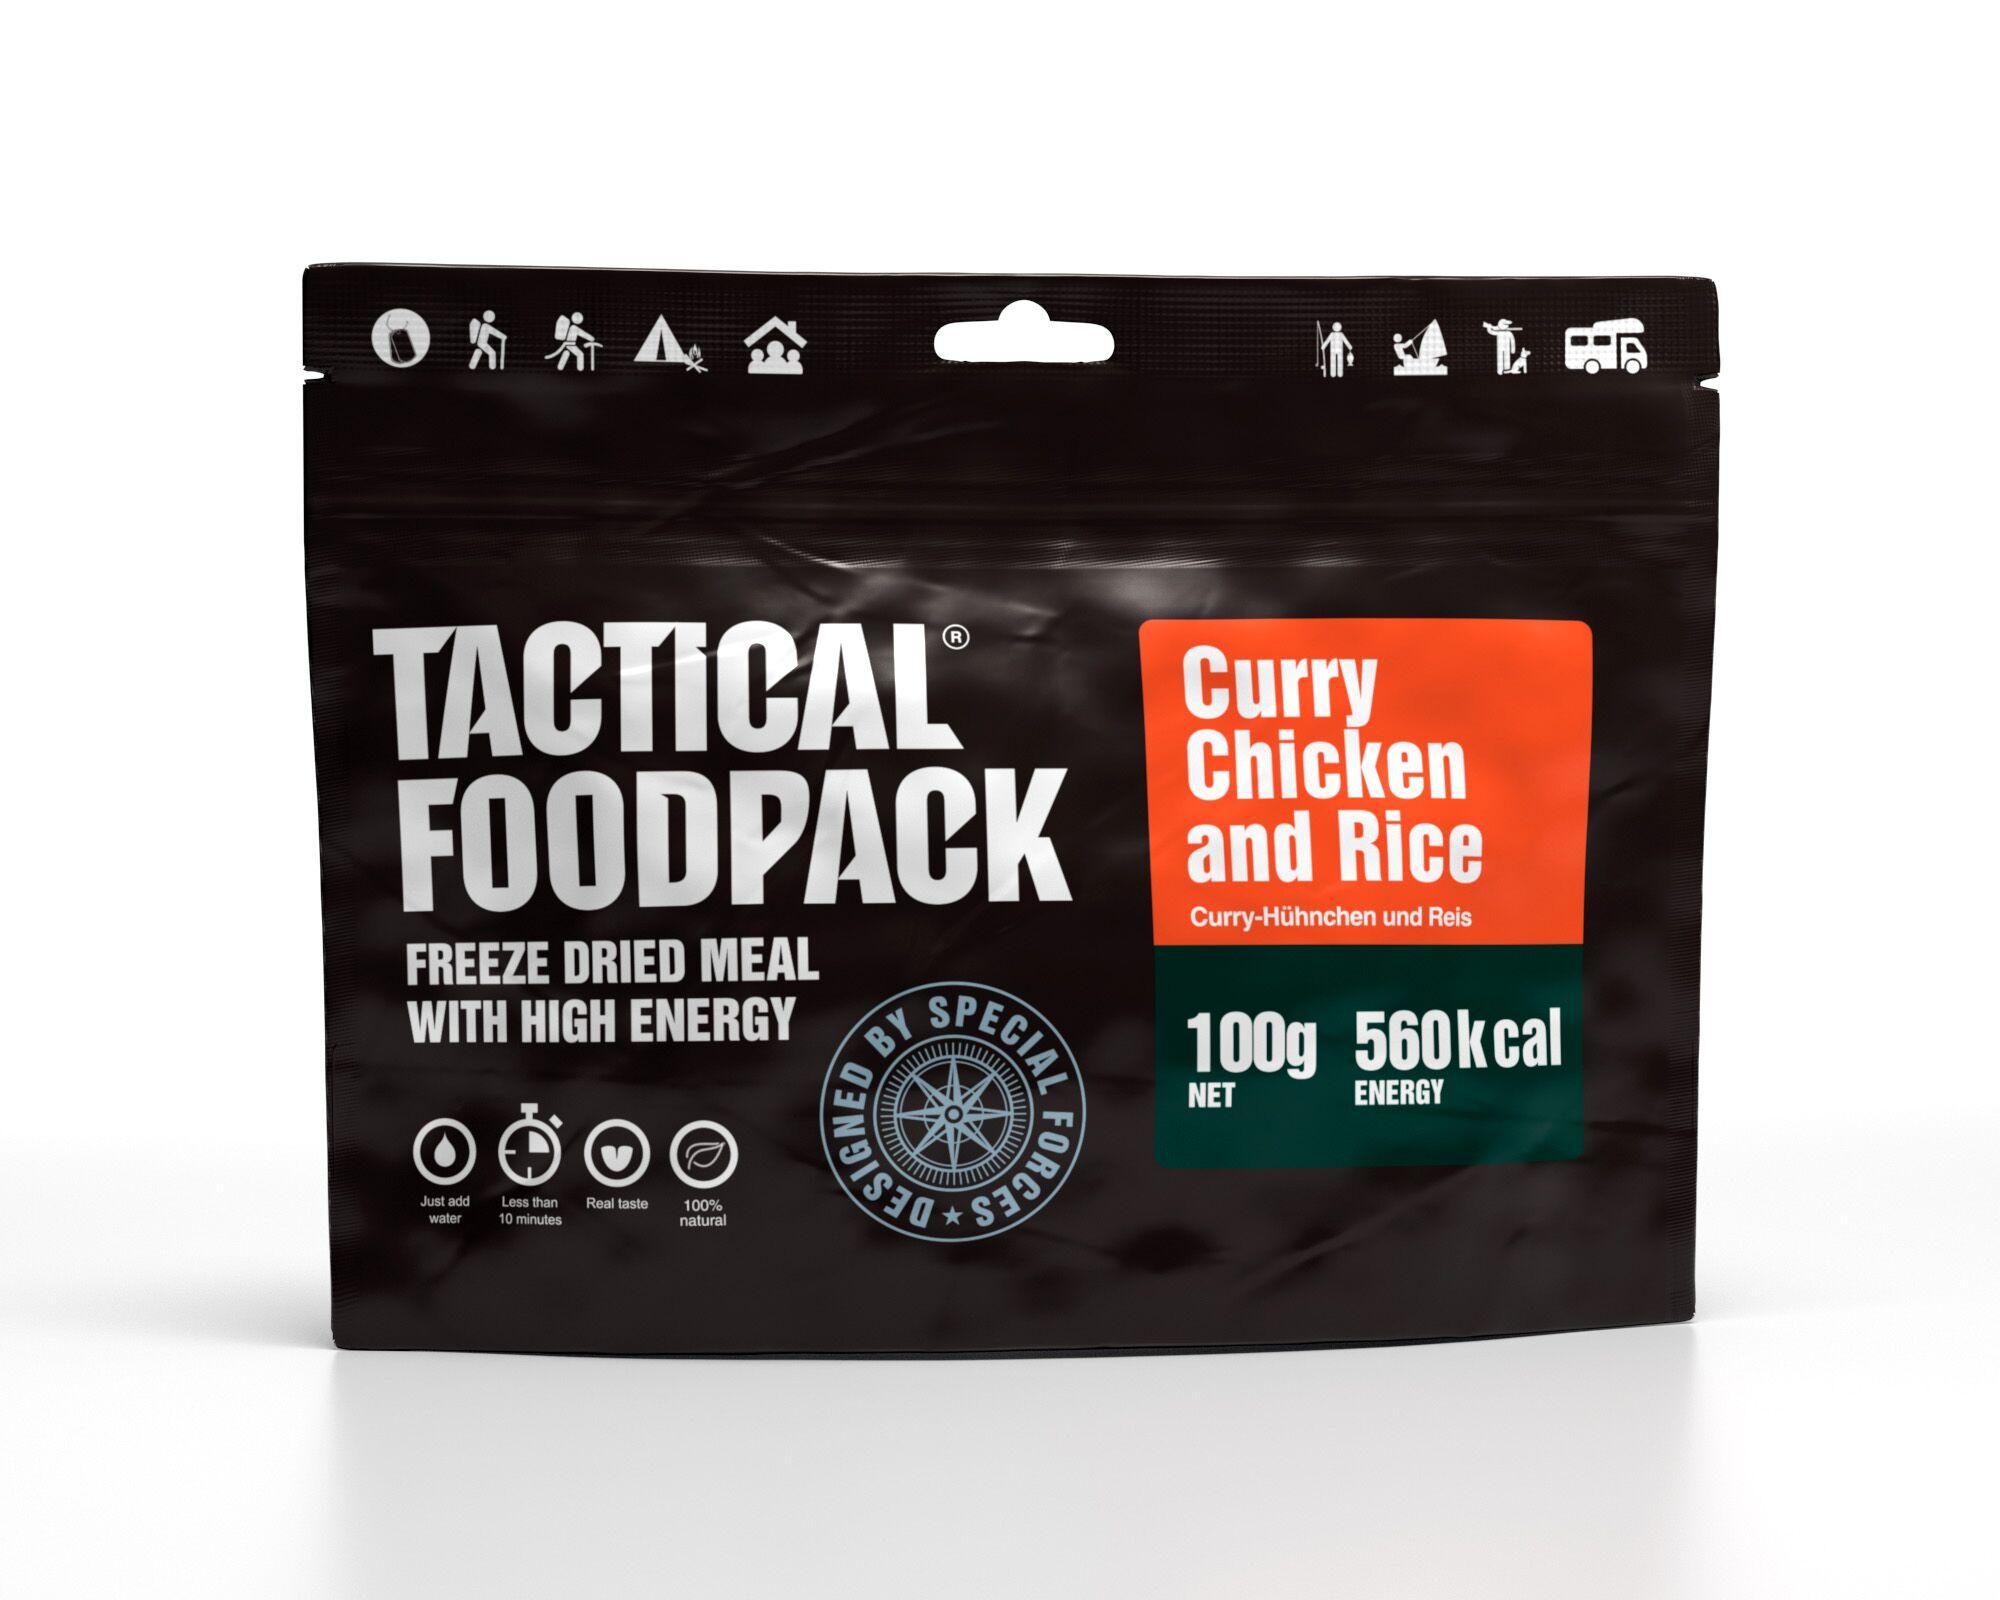 Dehidrirana hrana Tactical Foodpack - Curry Chicken and Rice , B33 army shop at www.opremljen.si, trgovina z vojaško opremo, vojaška trgovina